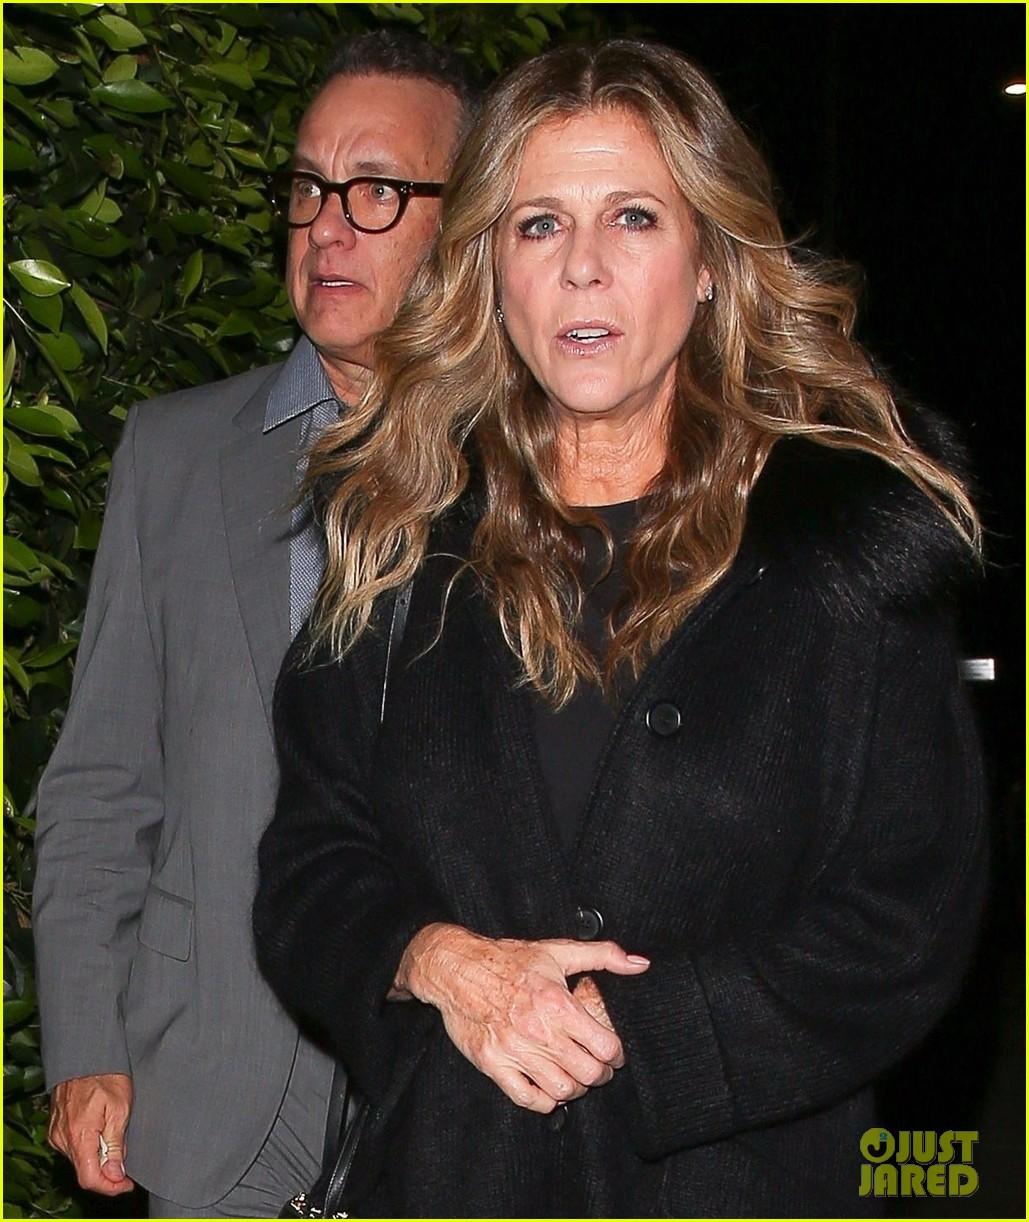 Tom Hanks & Rita Wilson Double Date With Bryan Cranston ...